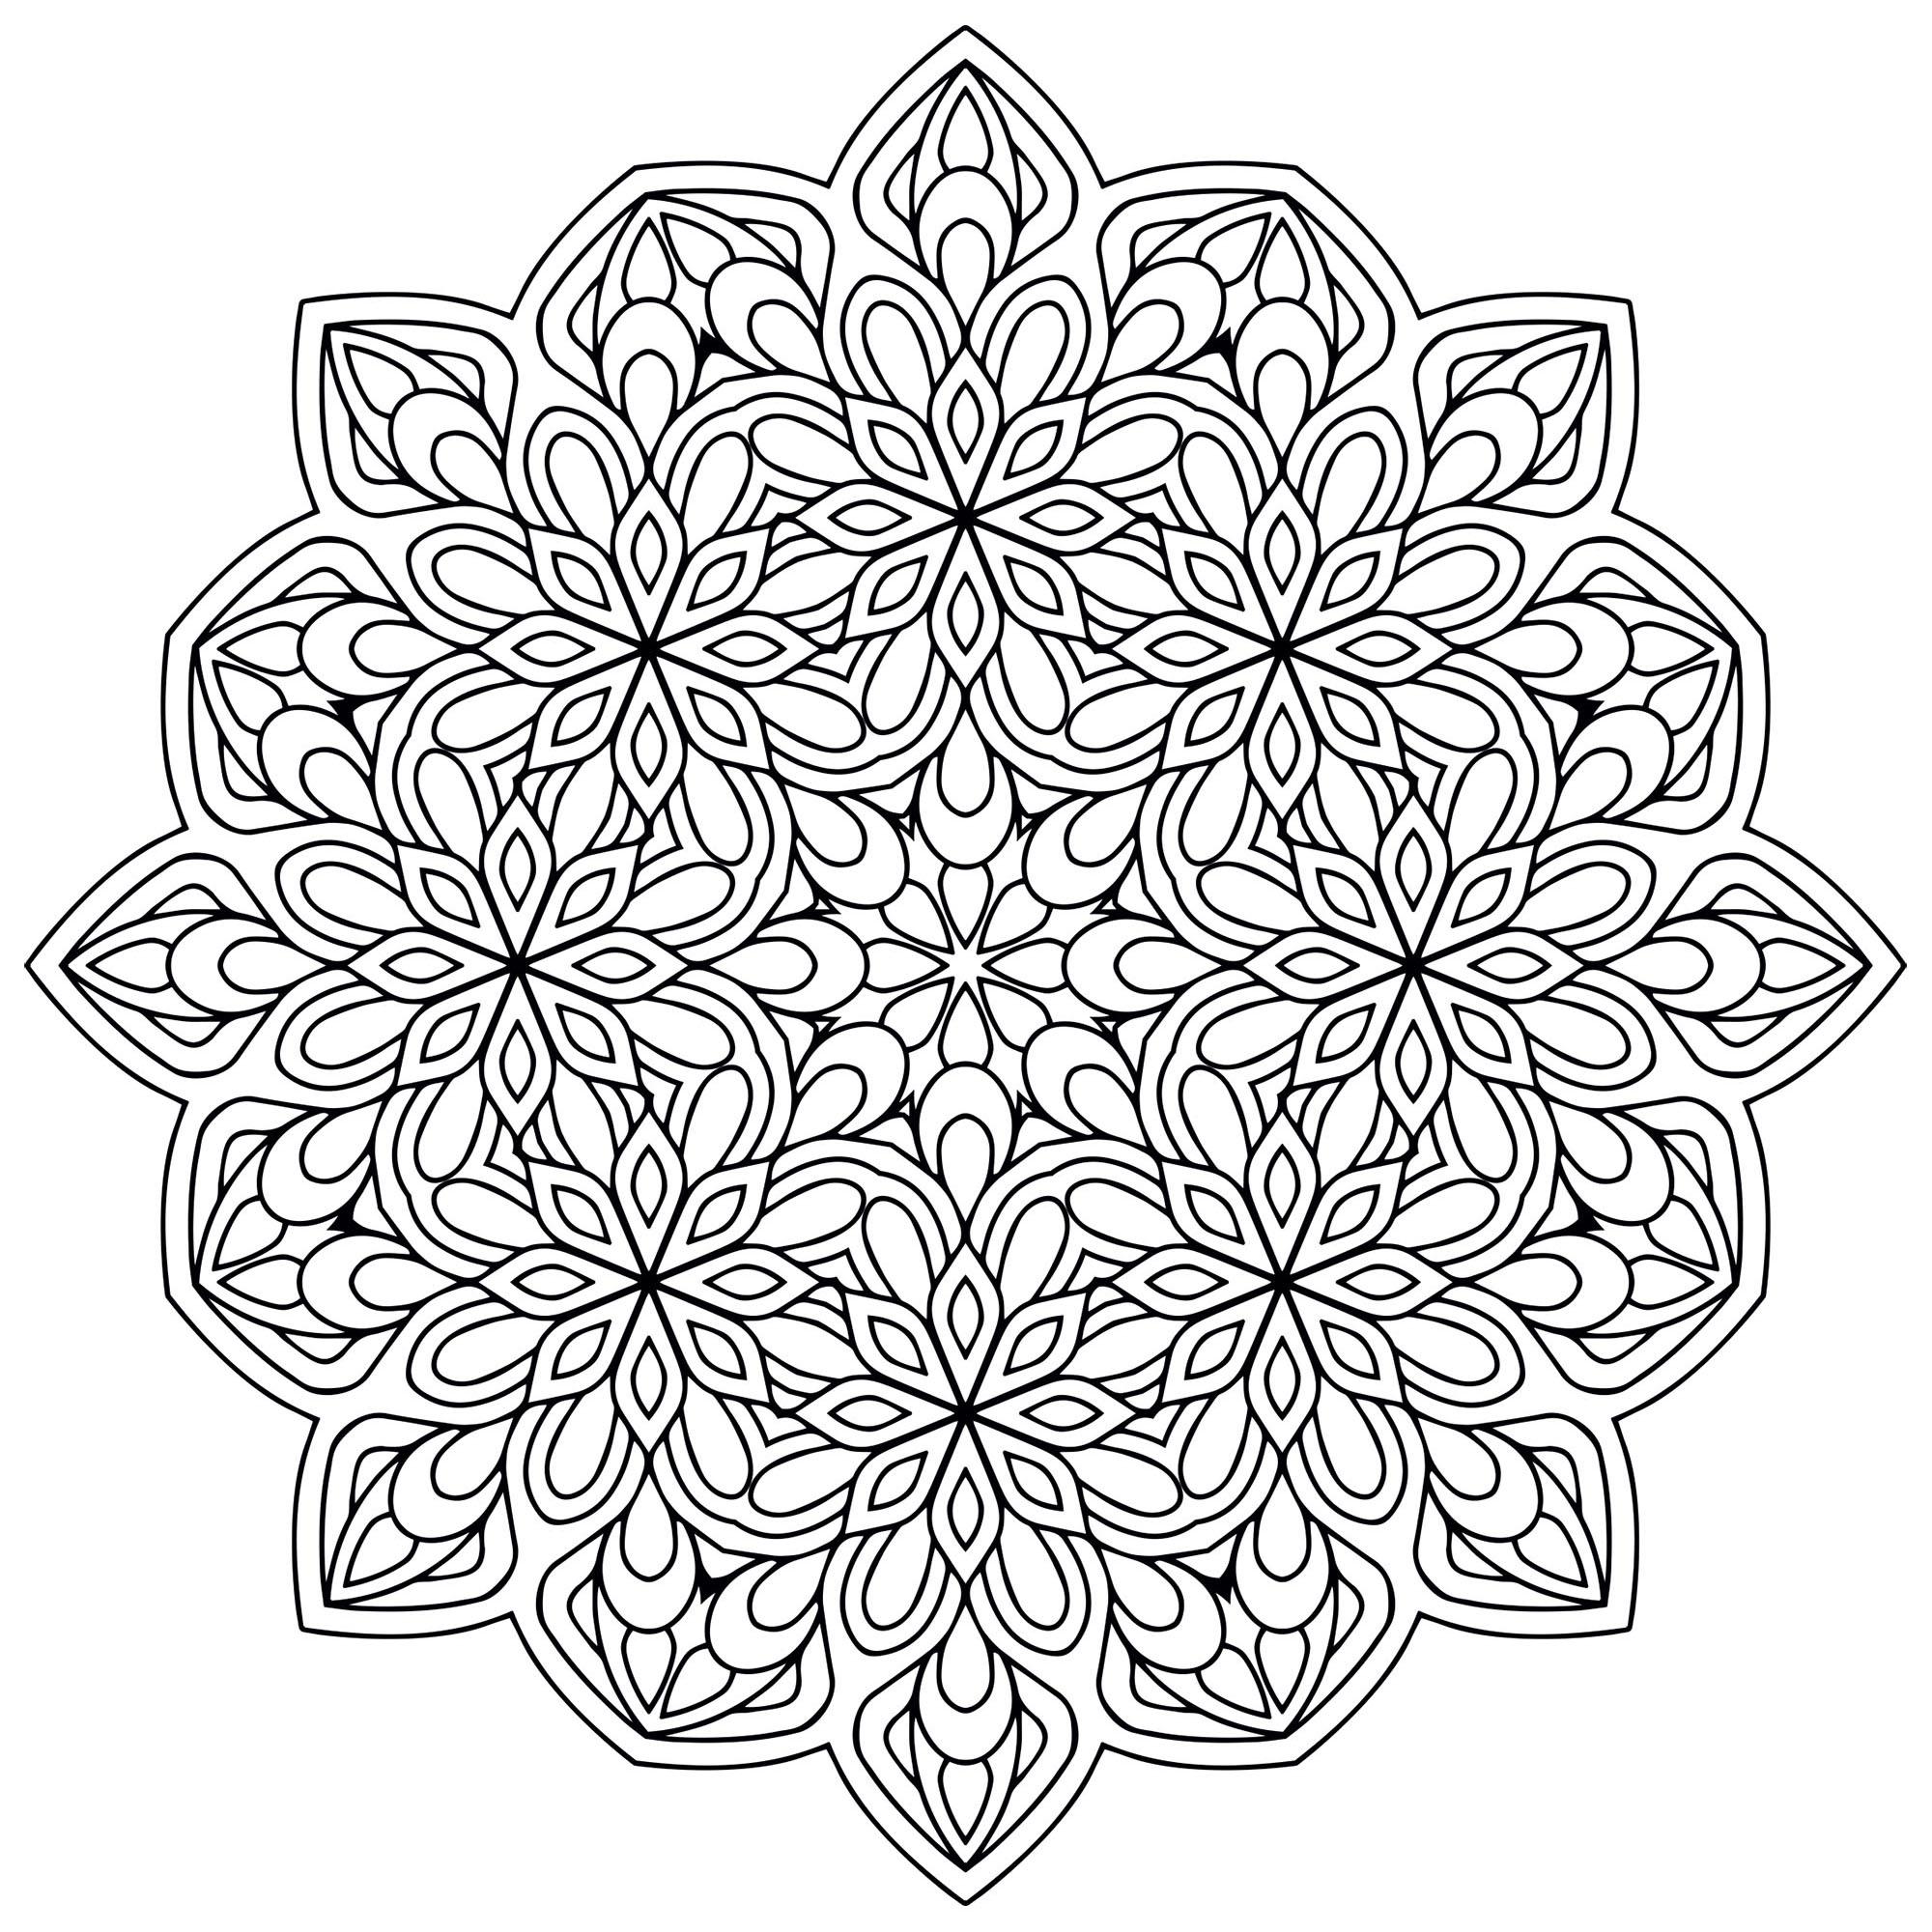 Mandala Zen Antistress 9 - Mandalas - Coloriages pour Mandala Coloriage